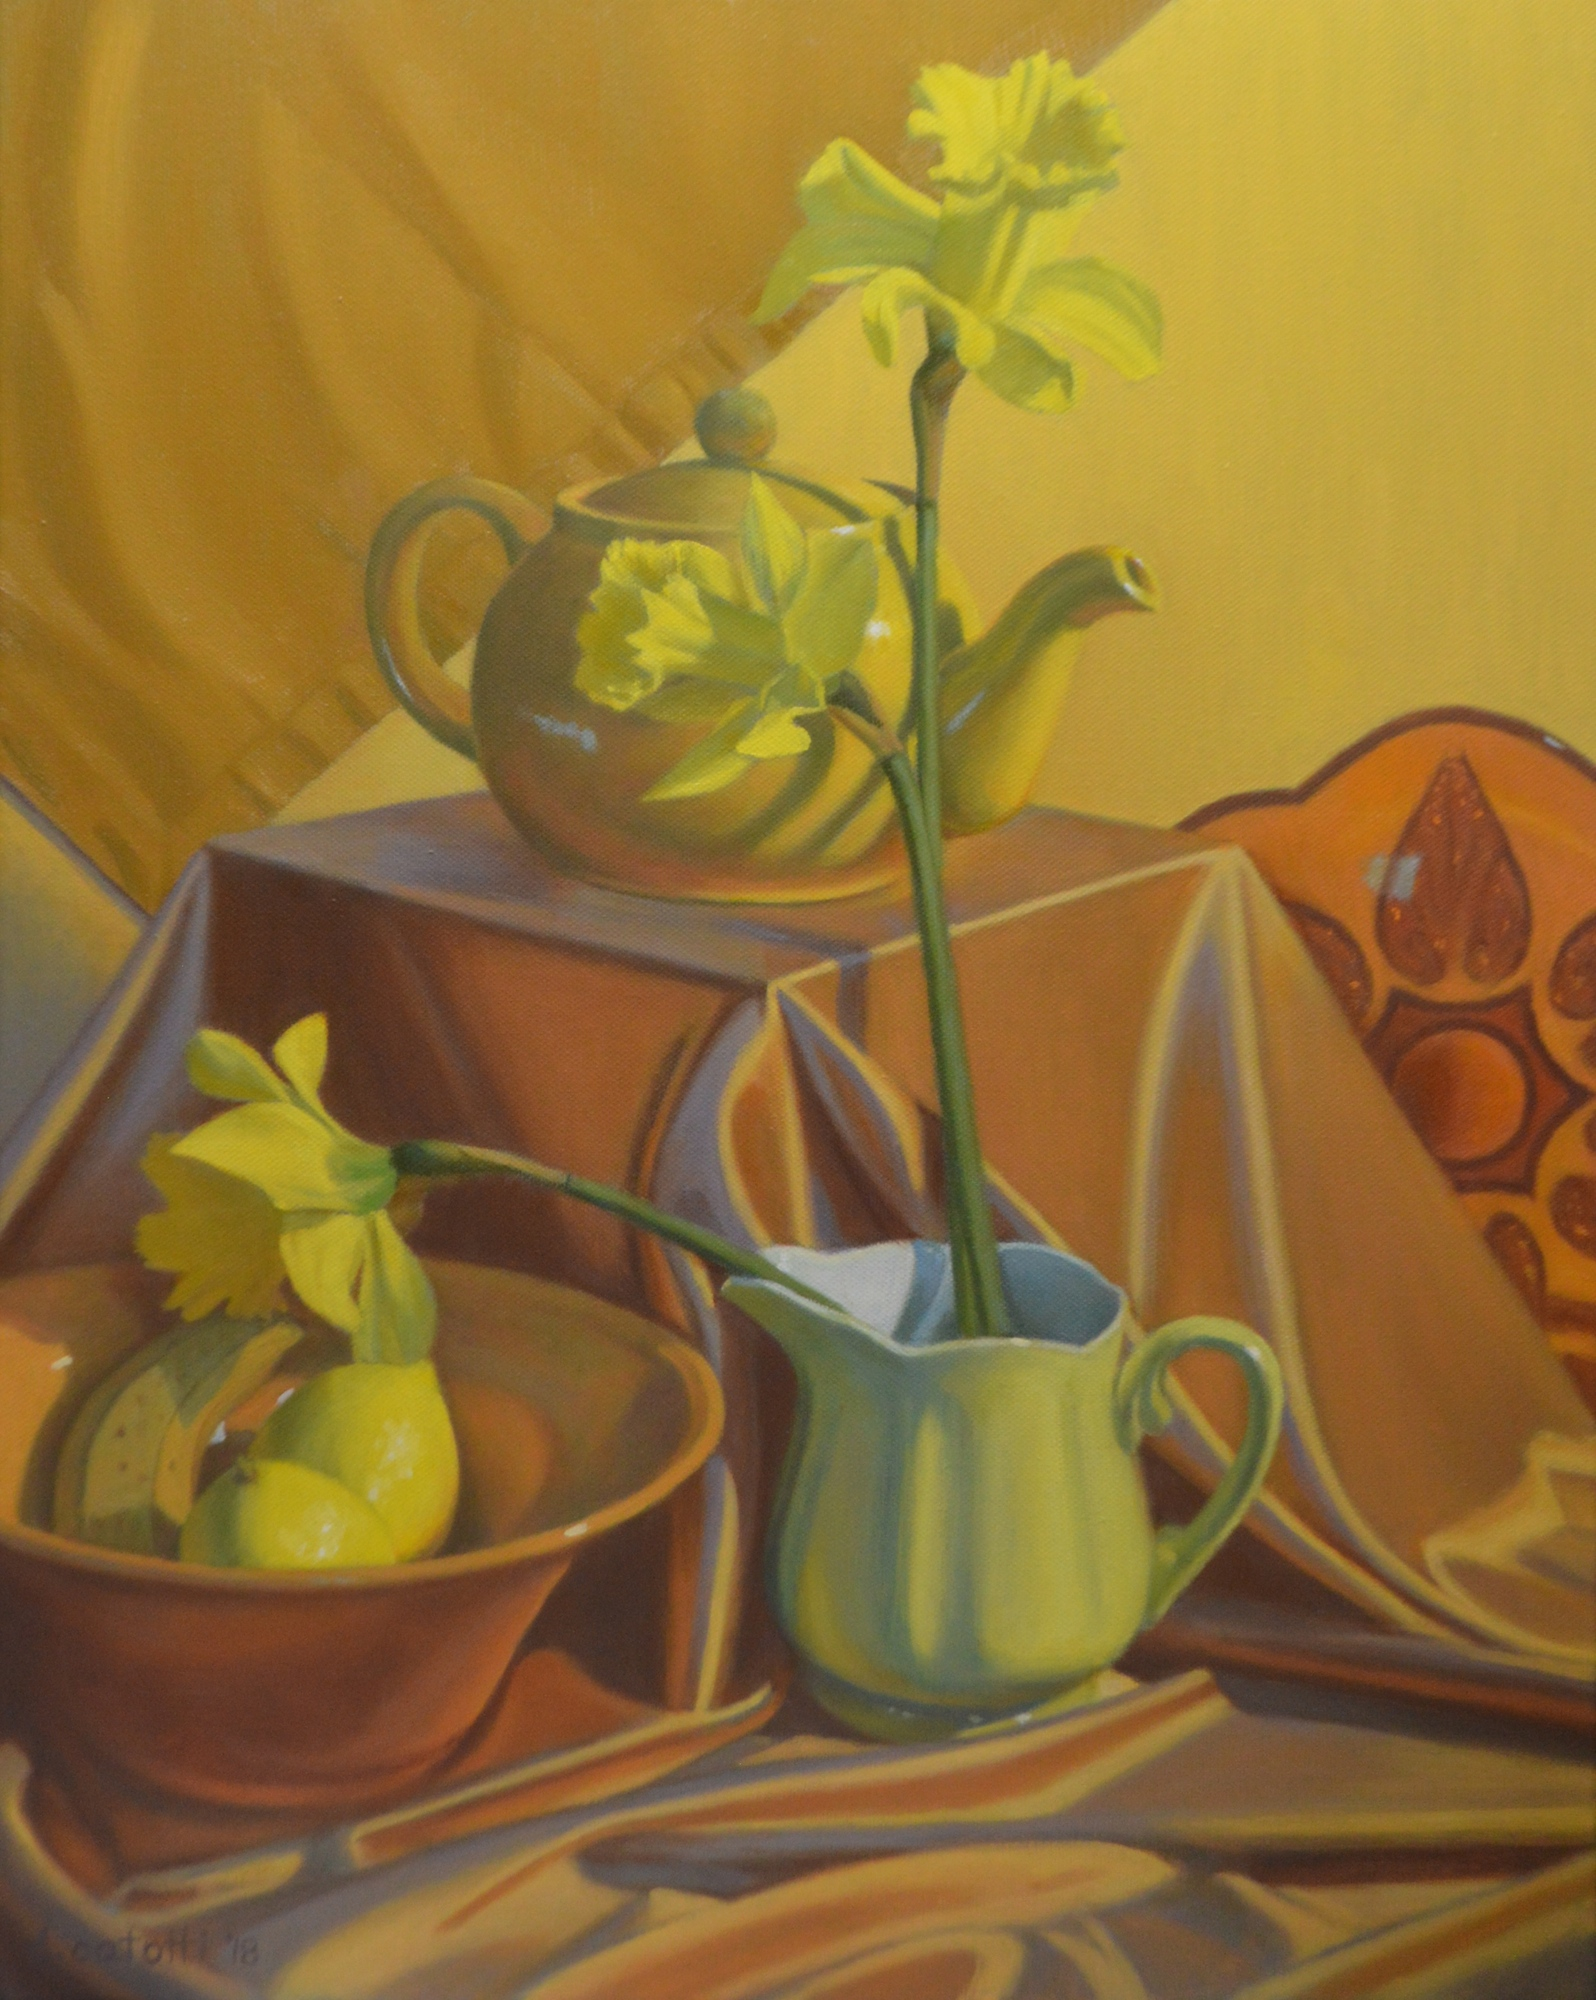 Donna Catotti Title: Still Life in Yellow Size: 20 x 16 x 0 Price: $3000